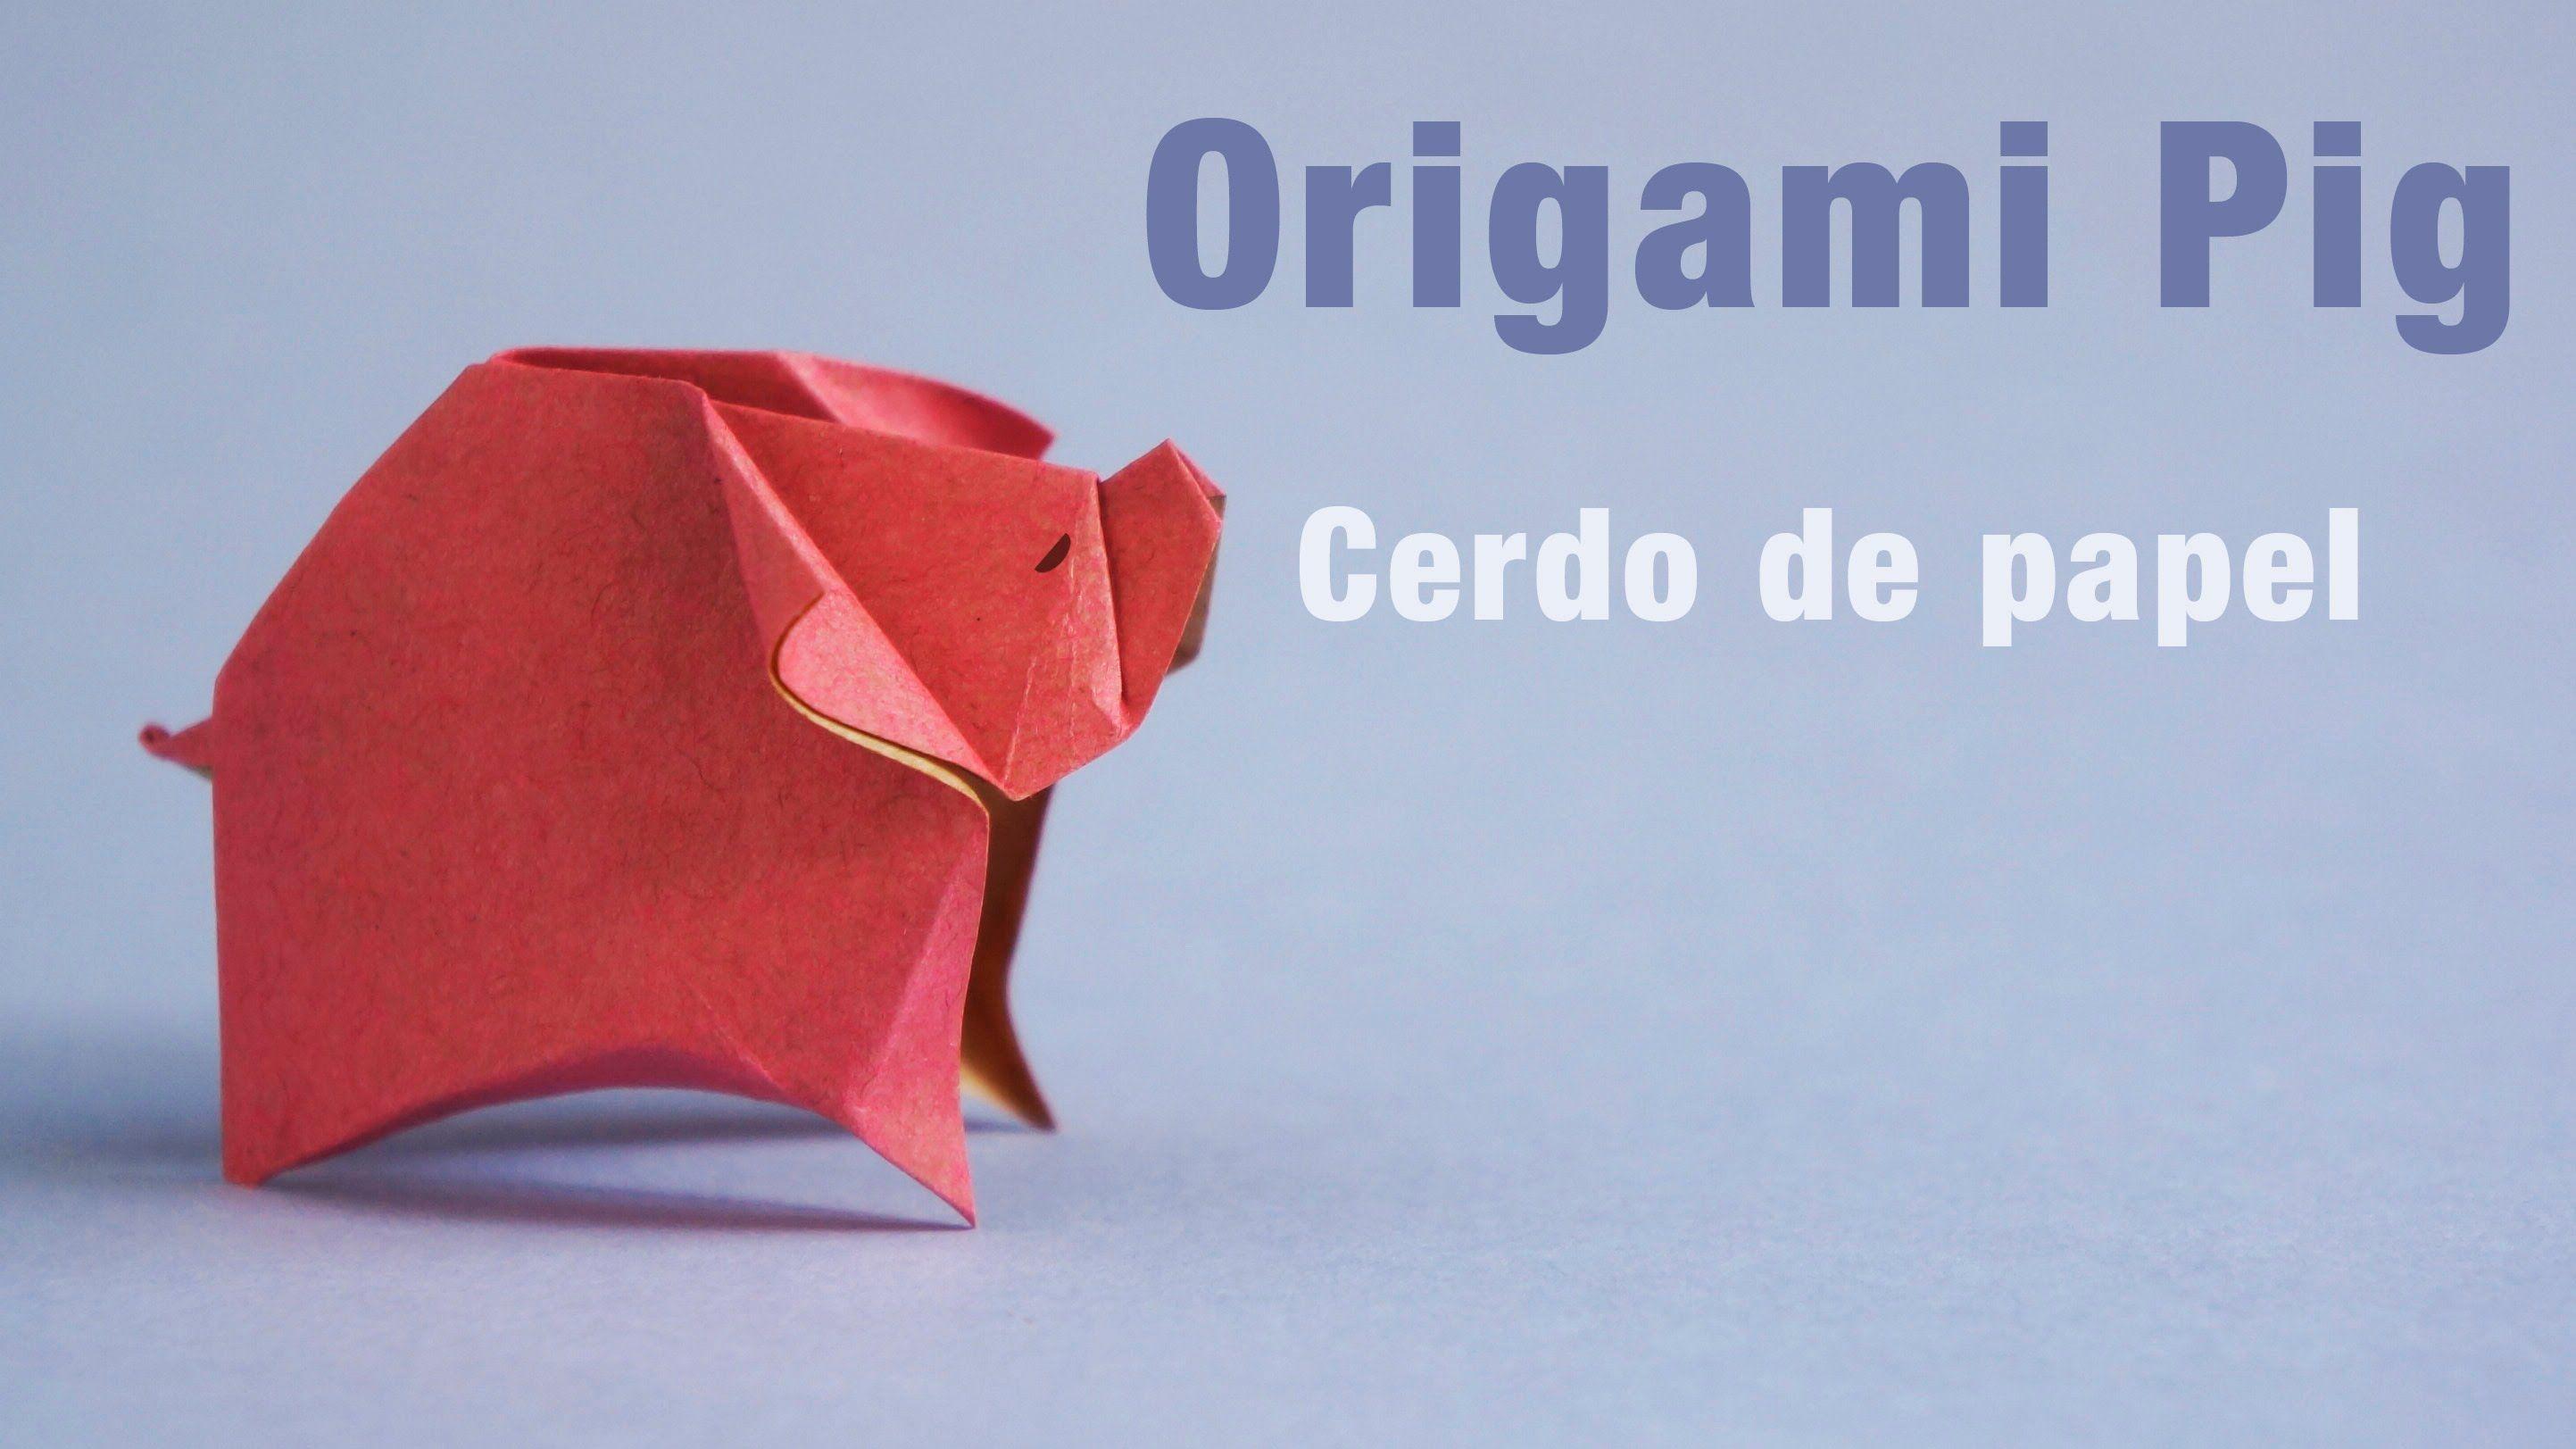 Origami Pig Cerdo En Tutorials 3 Video Diagram Quotswan Quyetquot